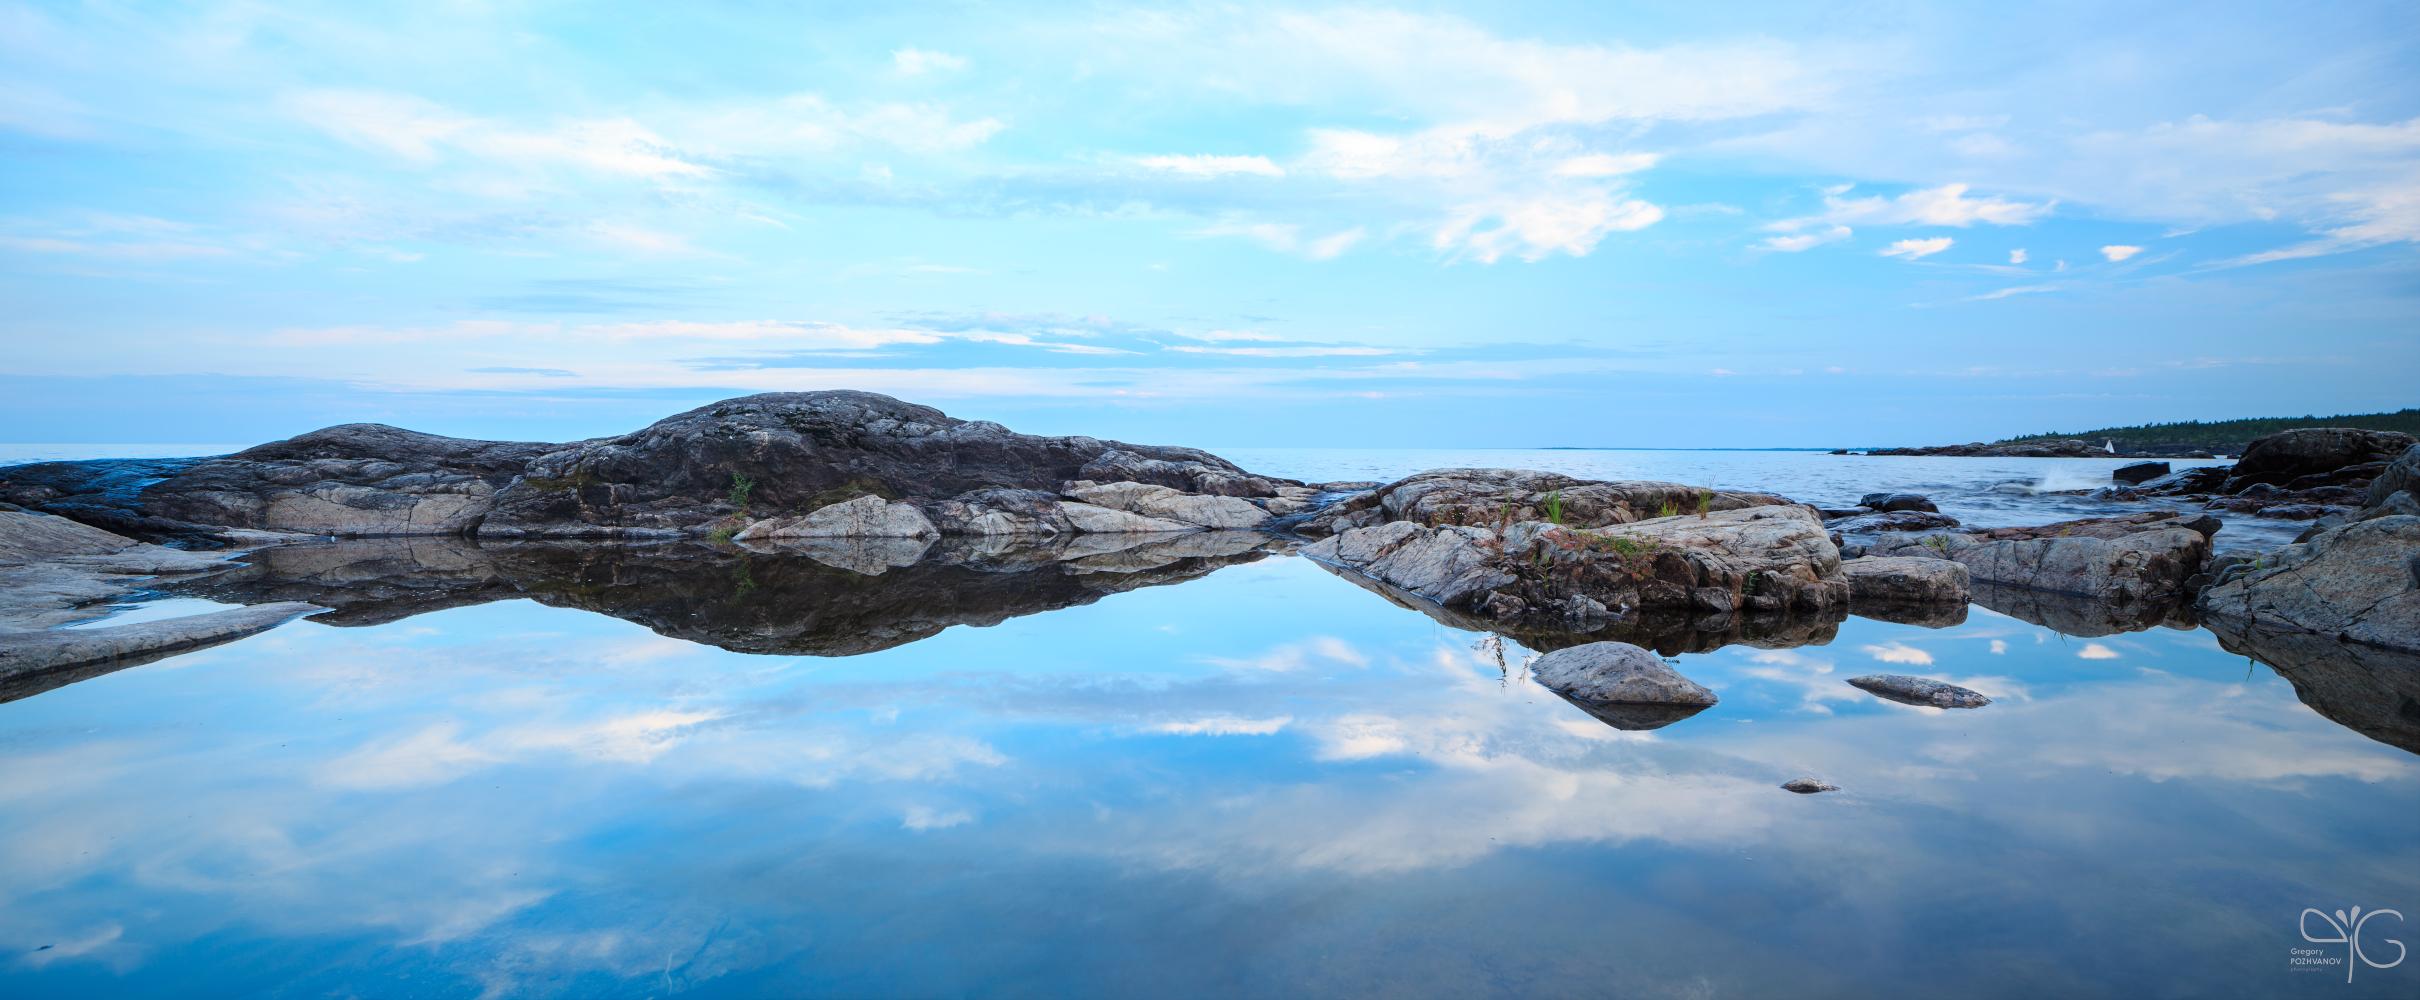 Каменистые берега острова Петросааренлуодот